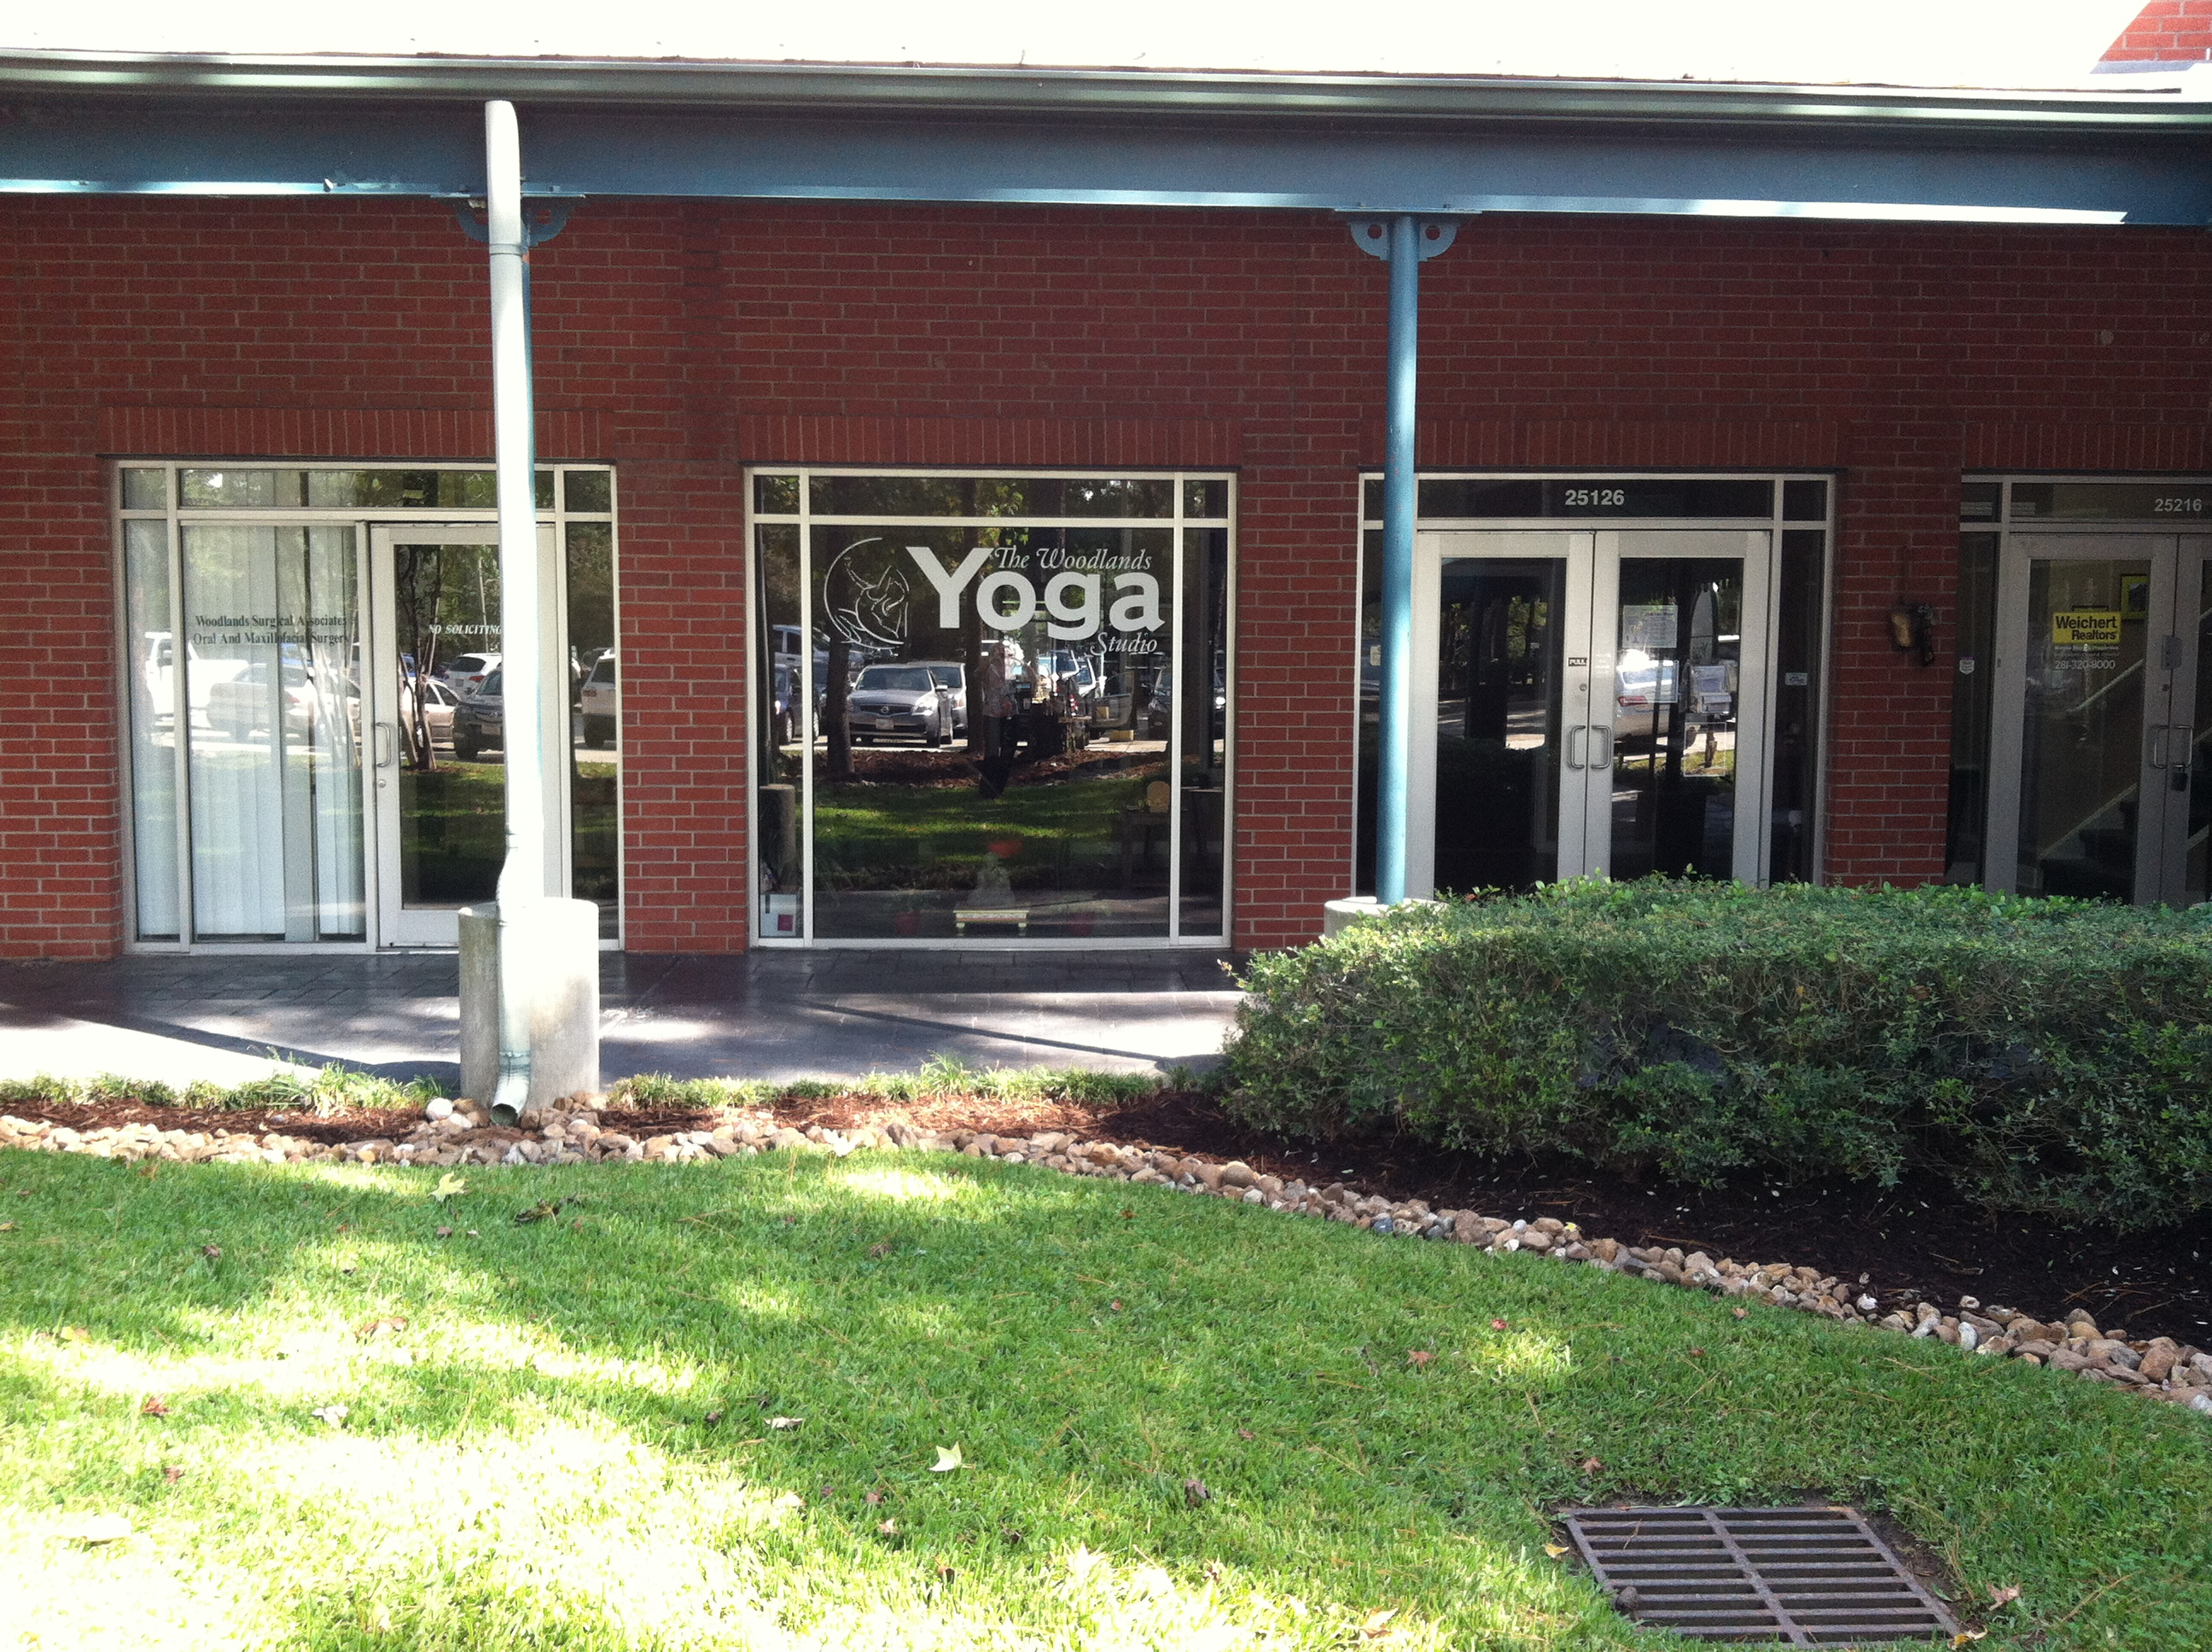 The Woodlands Yoga Studio image 1